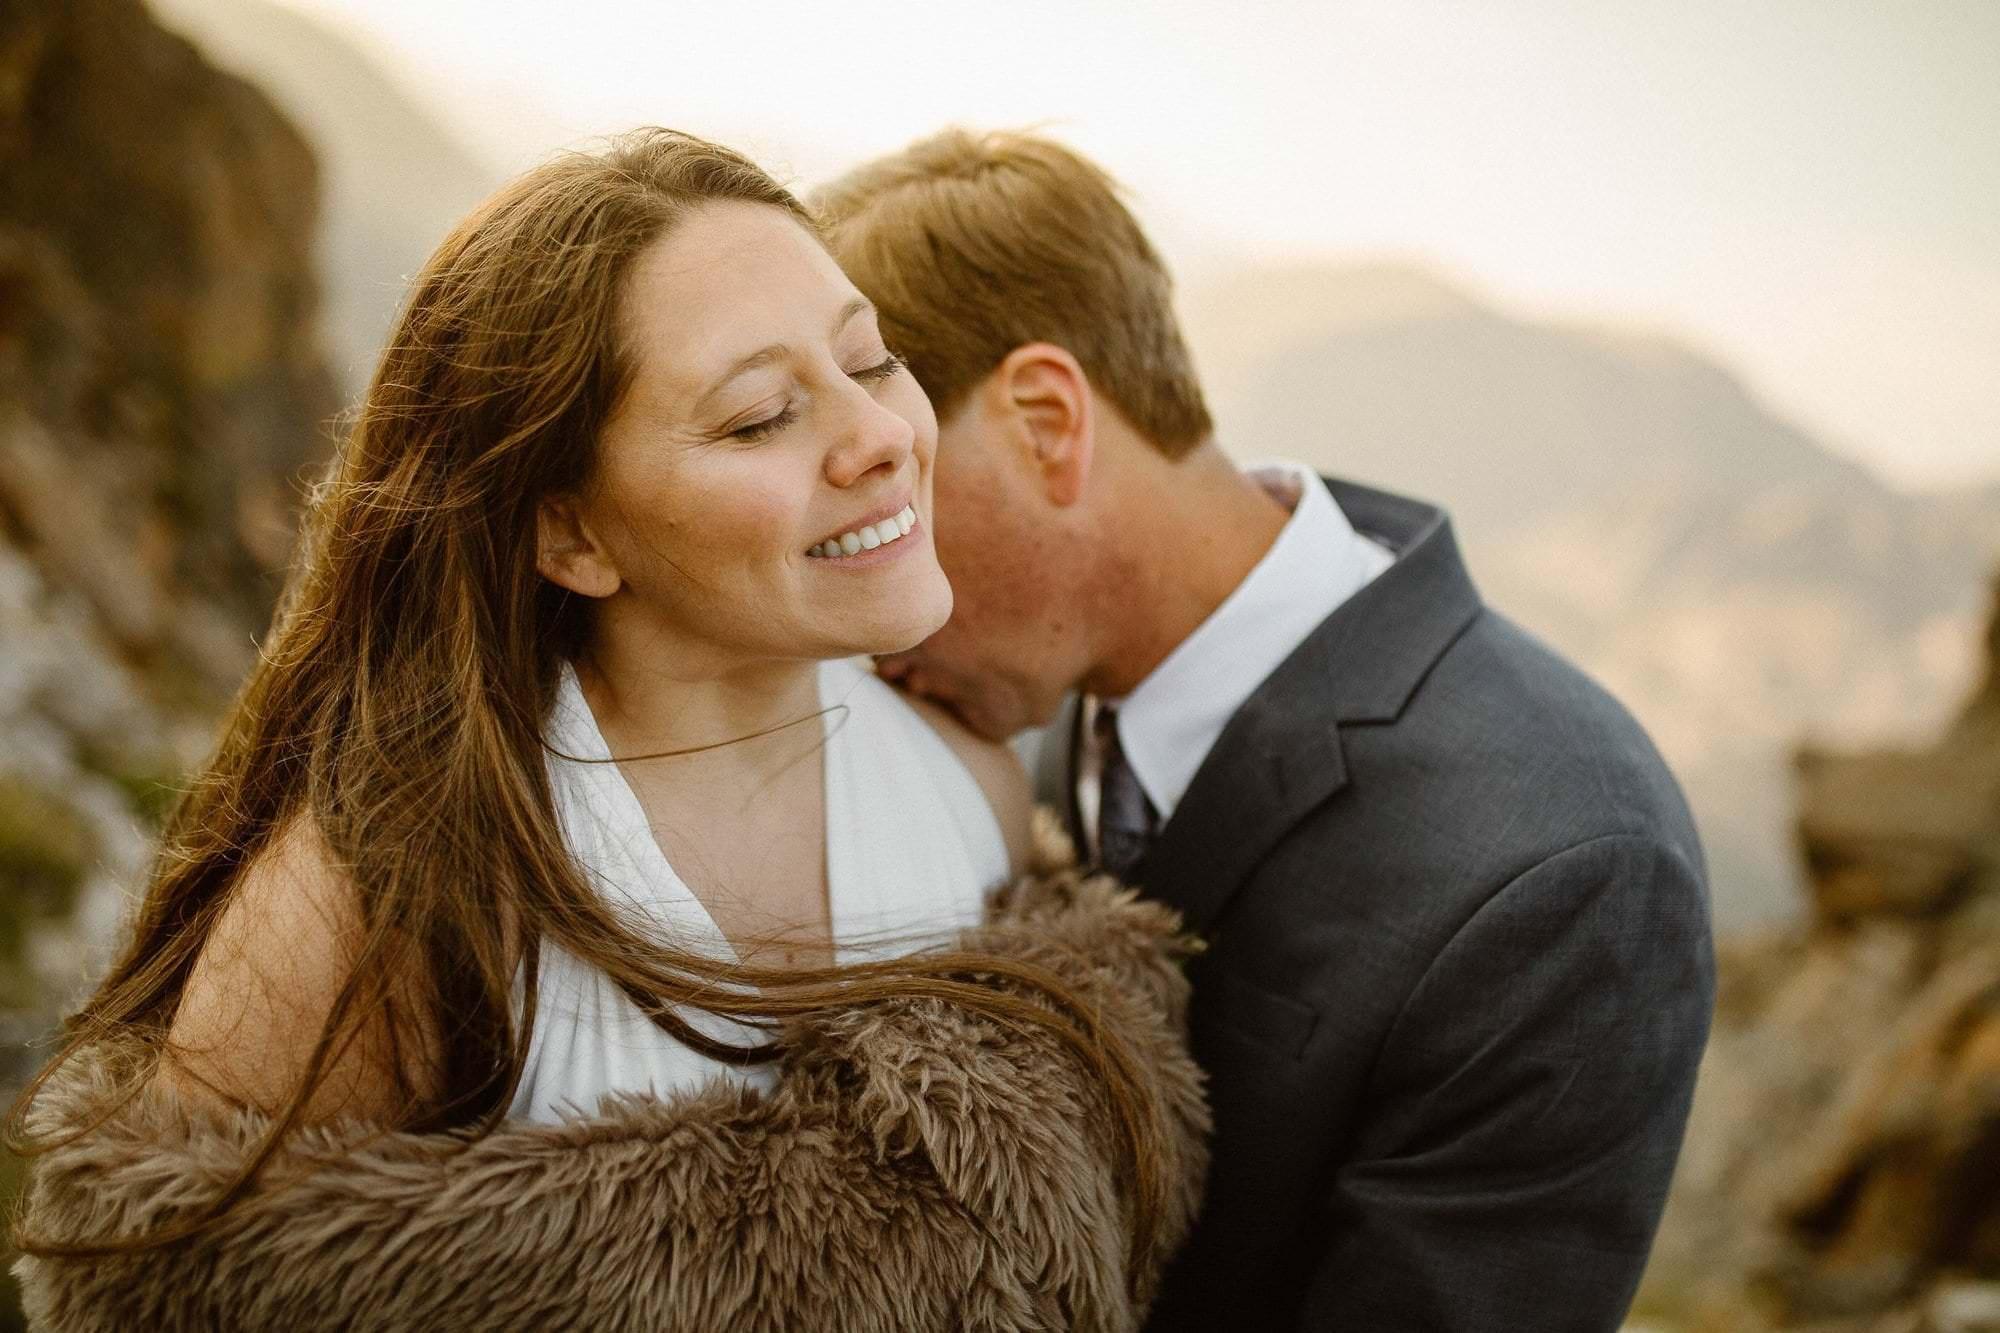 Sunrise at 1200 feet in Colorado. Colorado Intimate Weddings and Adventure Elopement Photographer | Rocky Mountain National Park Wedding Photographer | Adventure